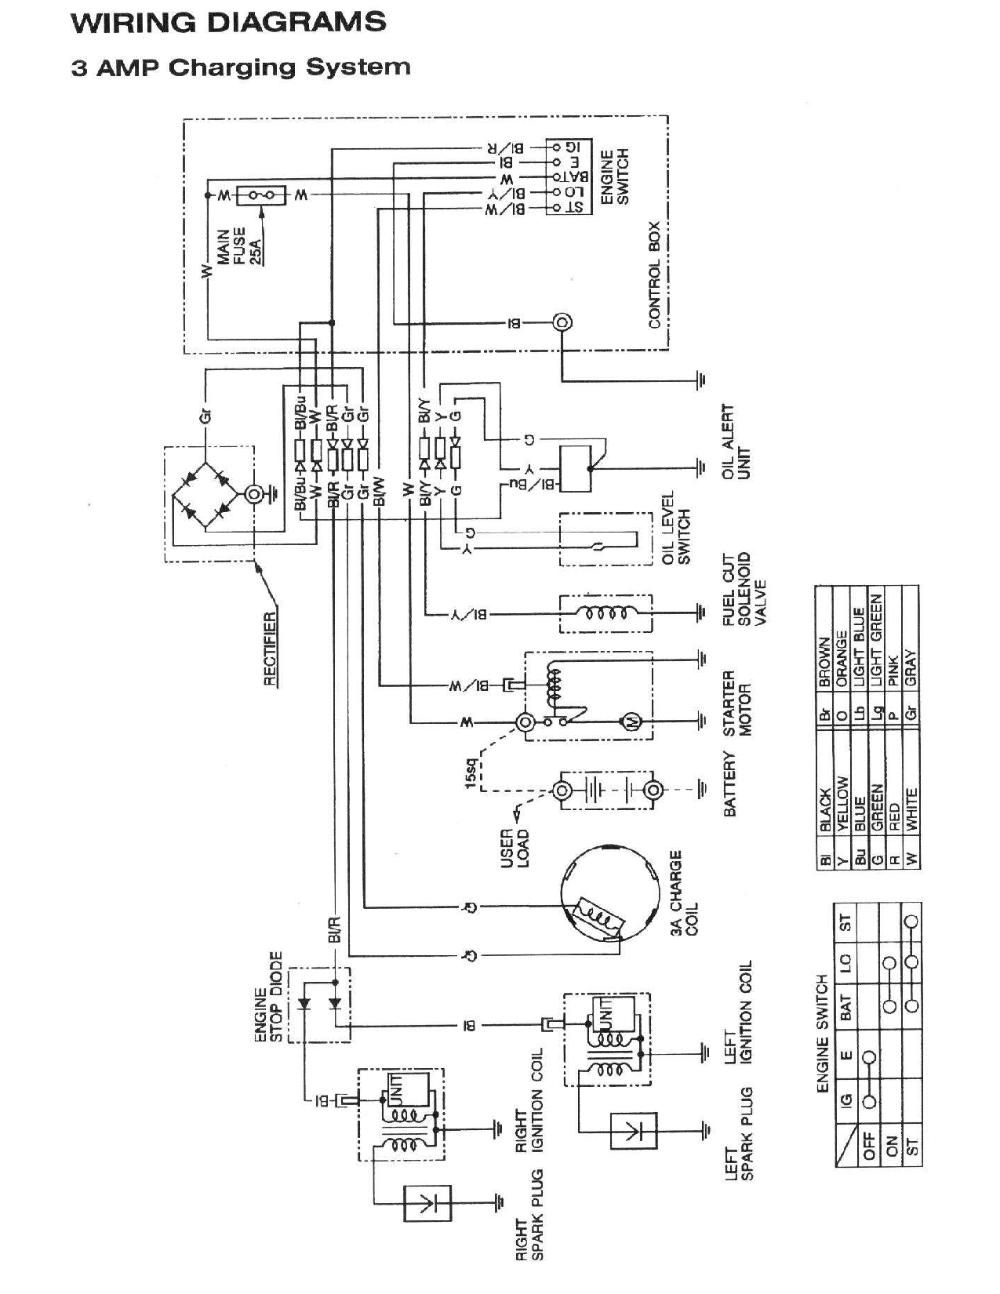 honda gx670 engine switch wiring diagram - Google Search in 2020 | Diagram,  Honda, EngineeringPinterest